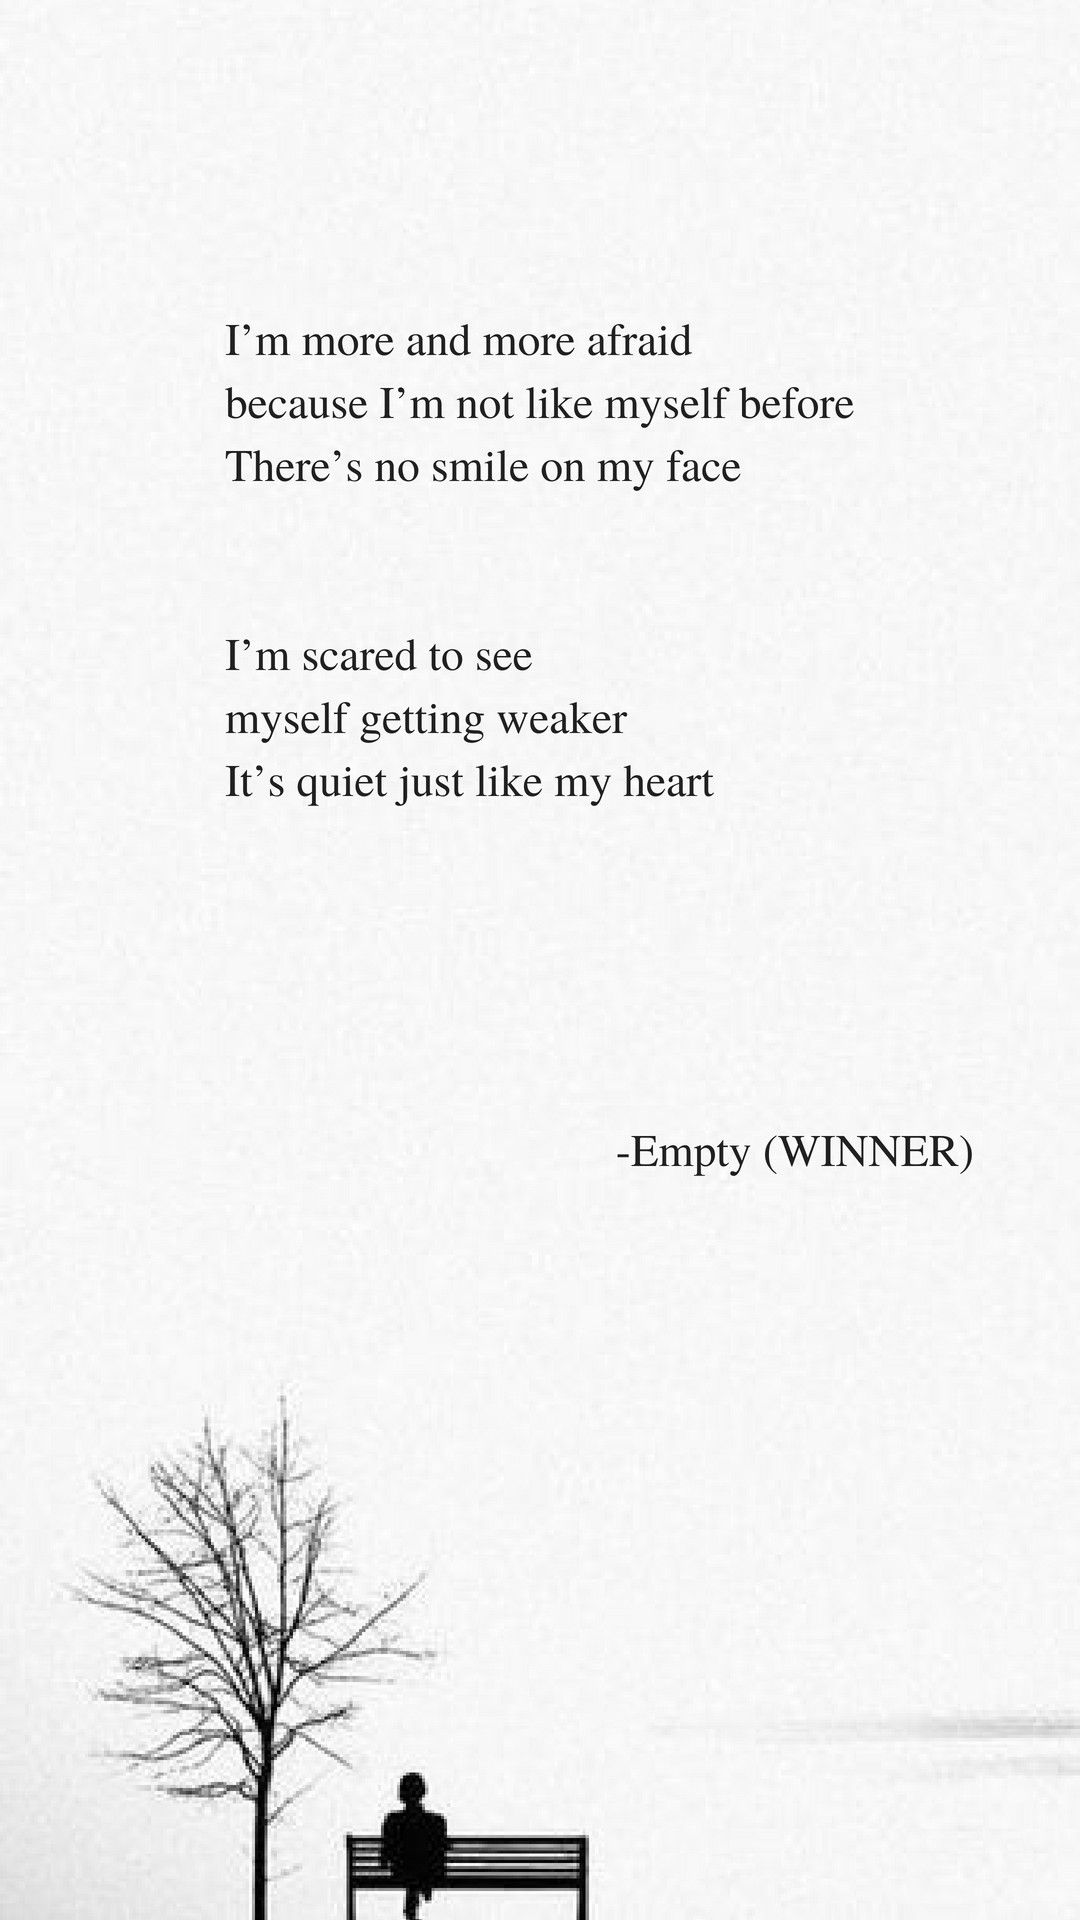 empty by winner lyrics song lyrics kpop quotes